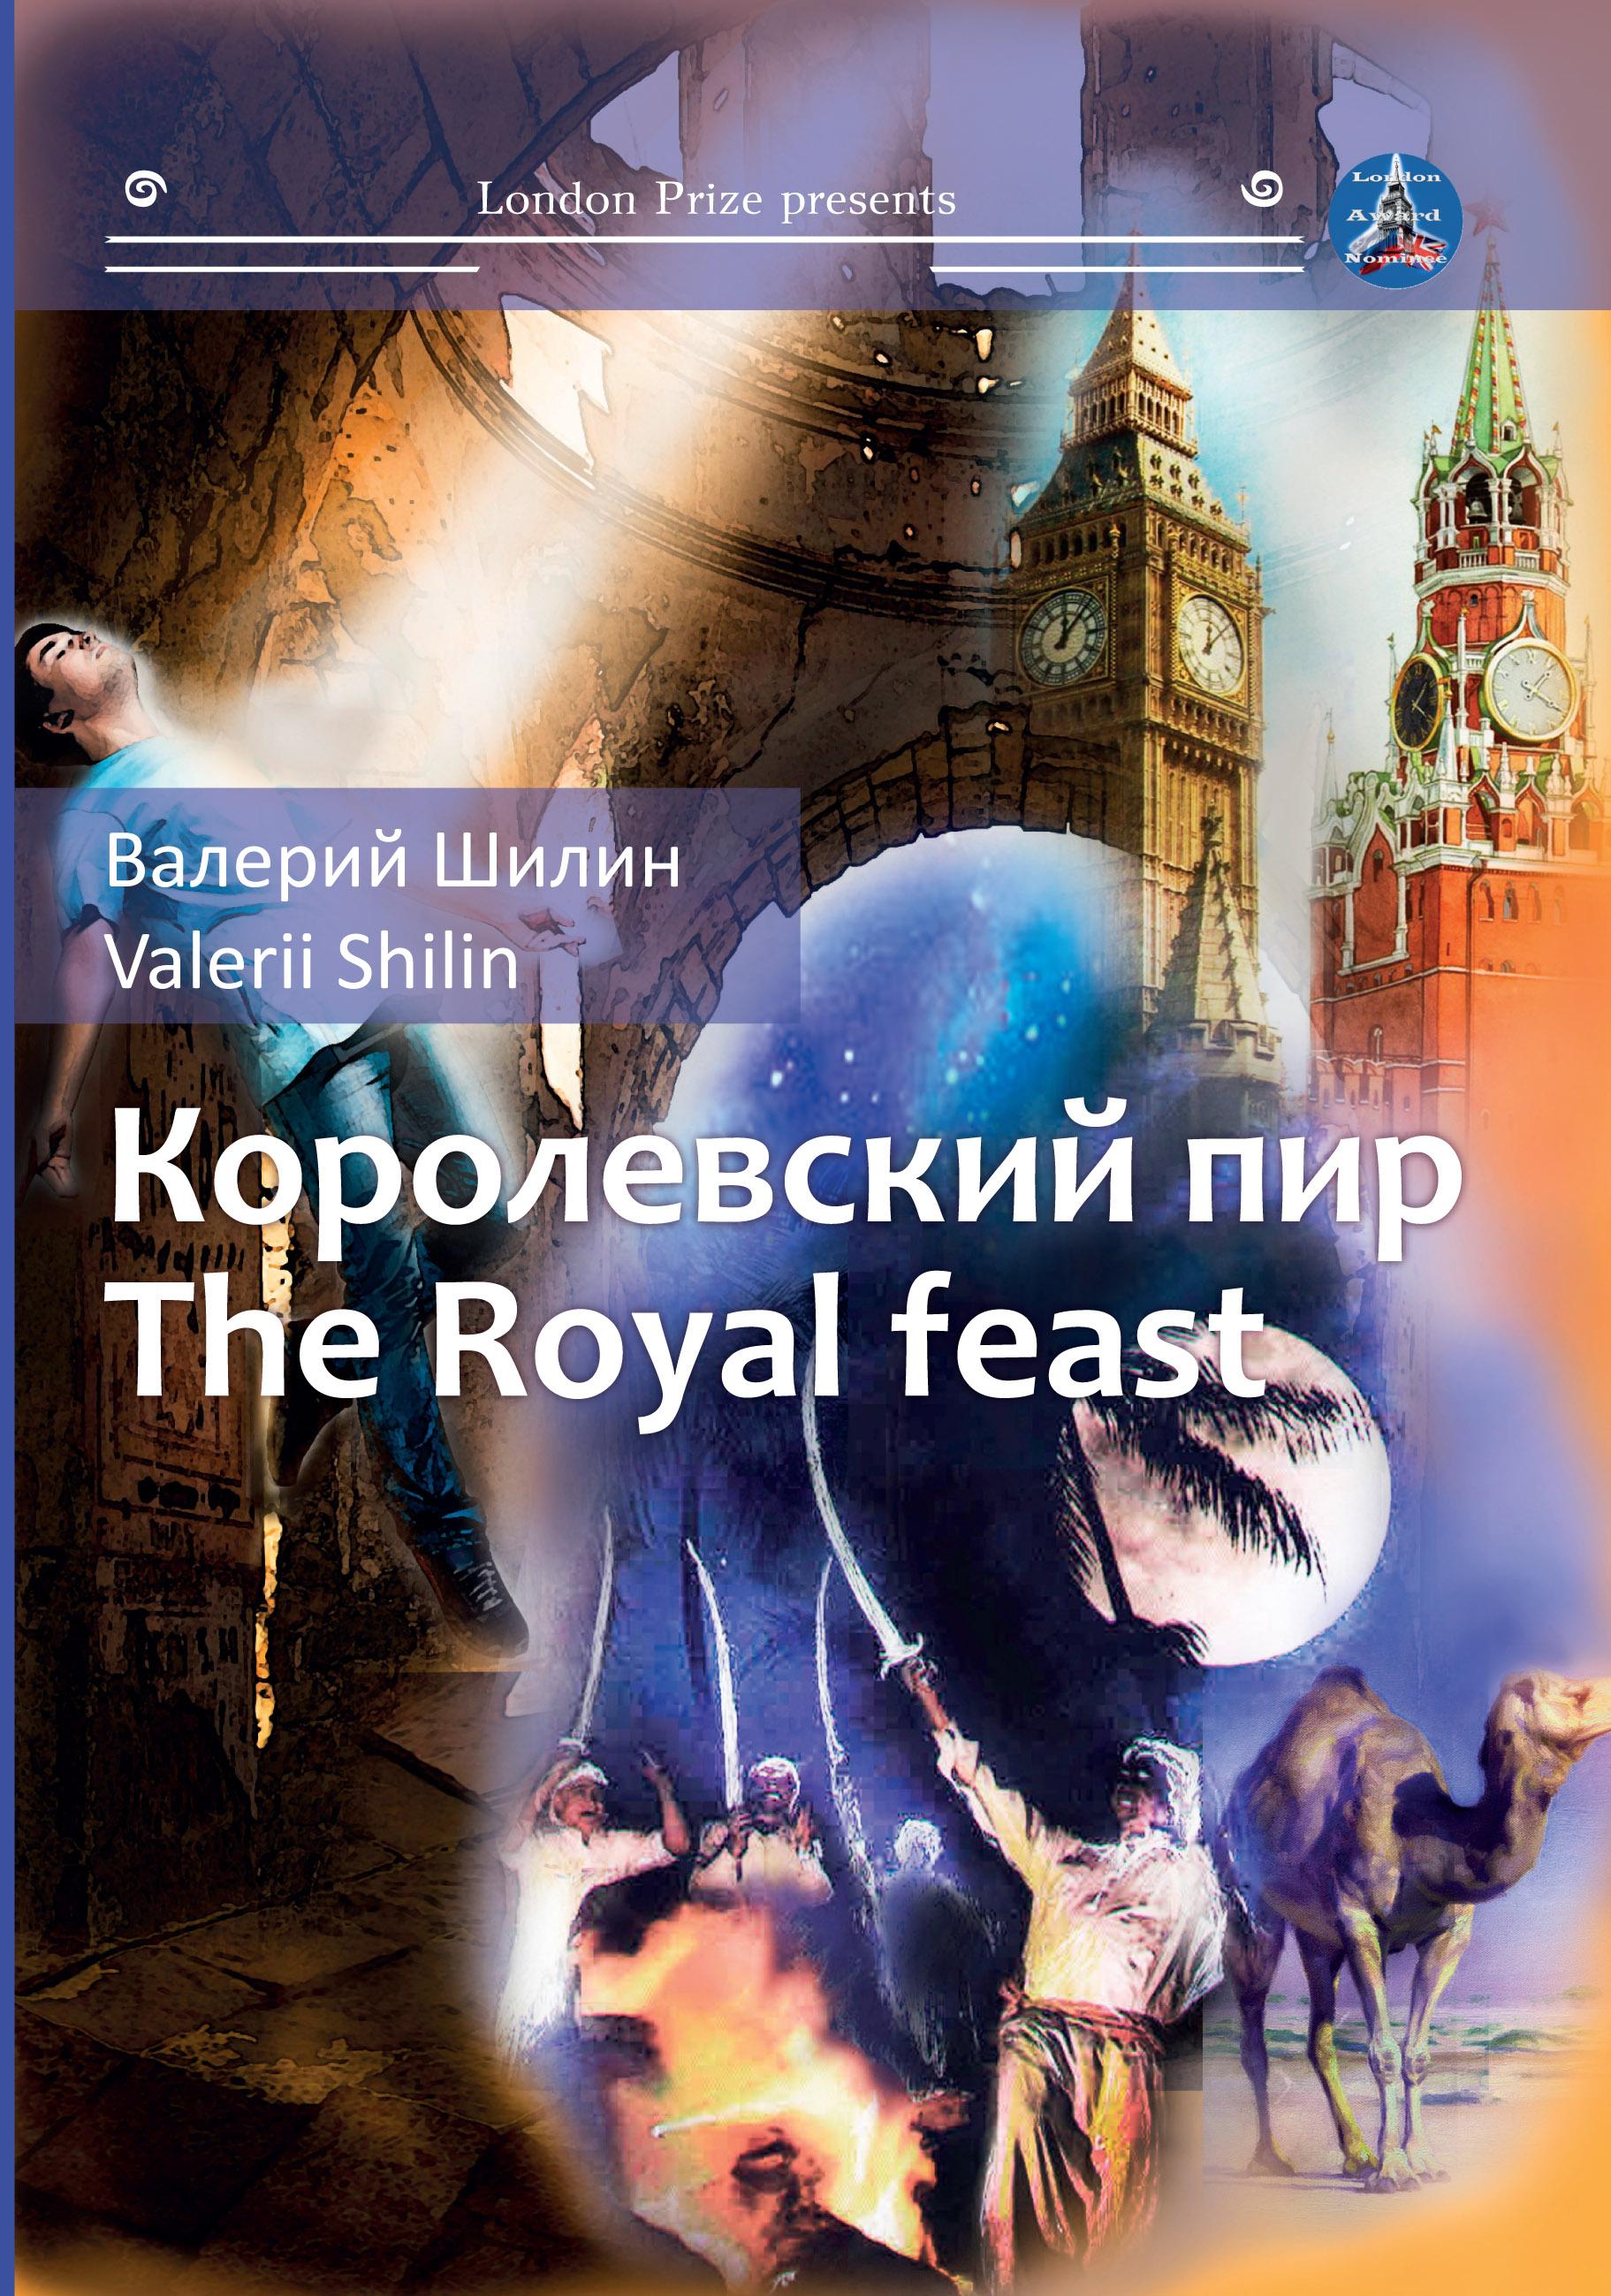 Валерий Шилин Королевский пир / Royal feast